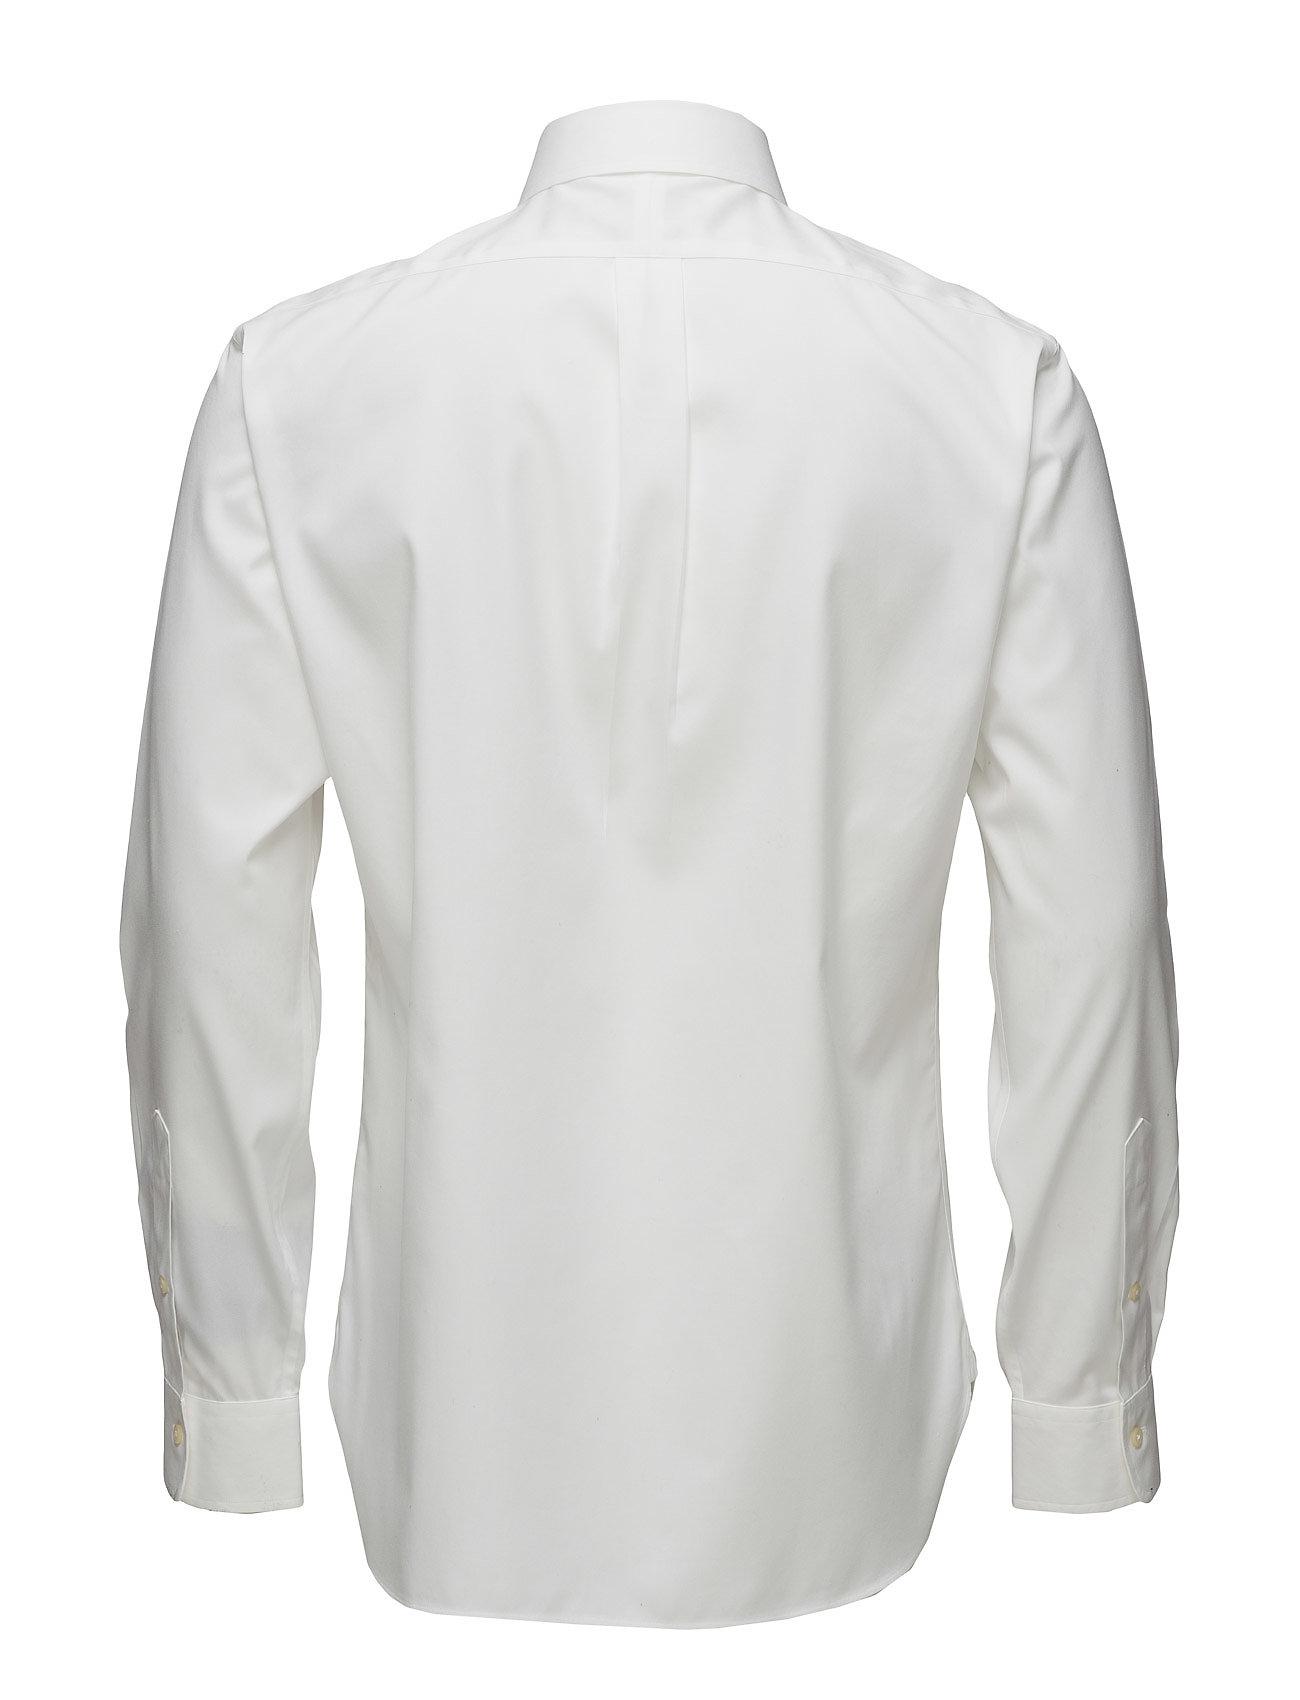 dress ShirtwhitePolo Ppc Ralph S Lauren Hbd Nk NOnk0w8PX